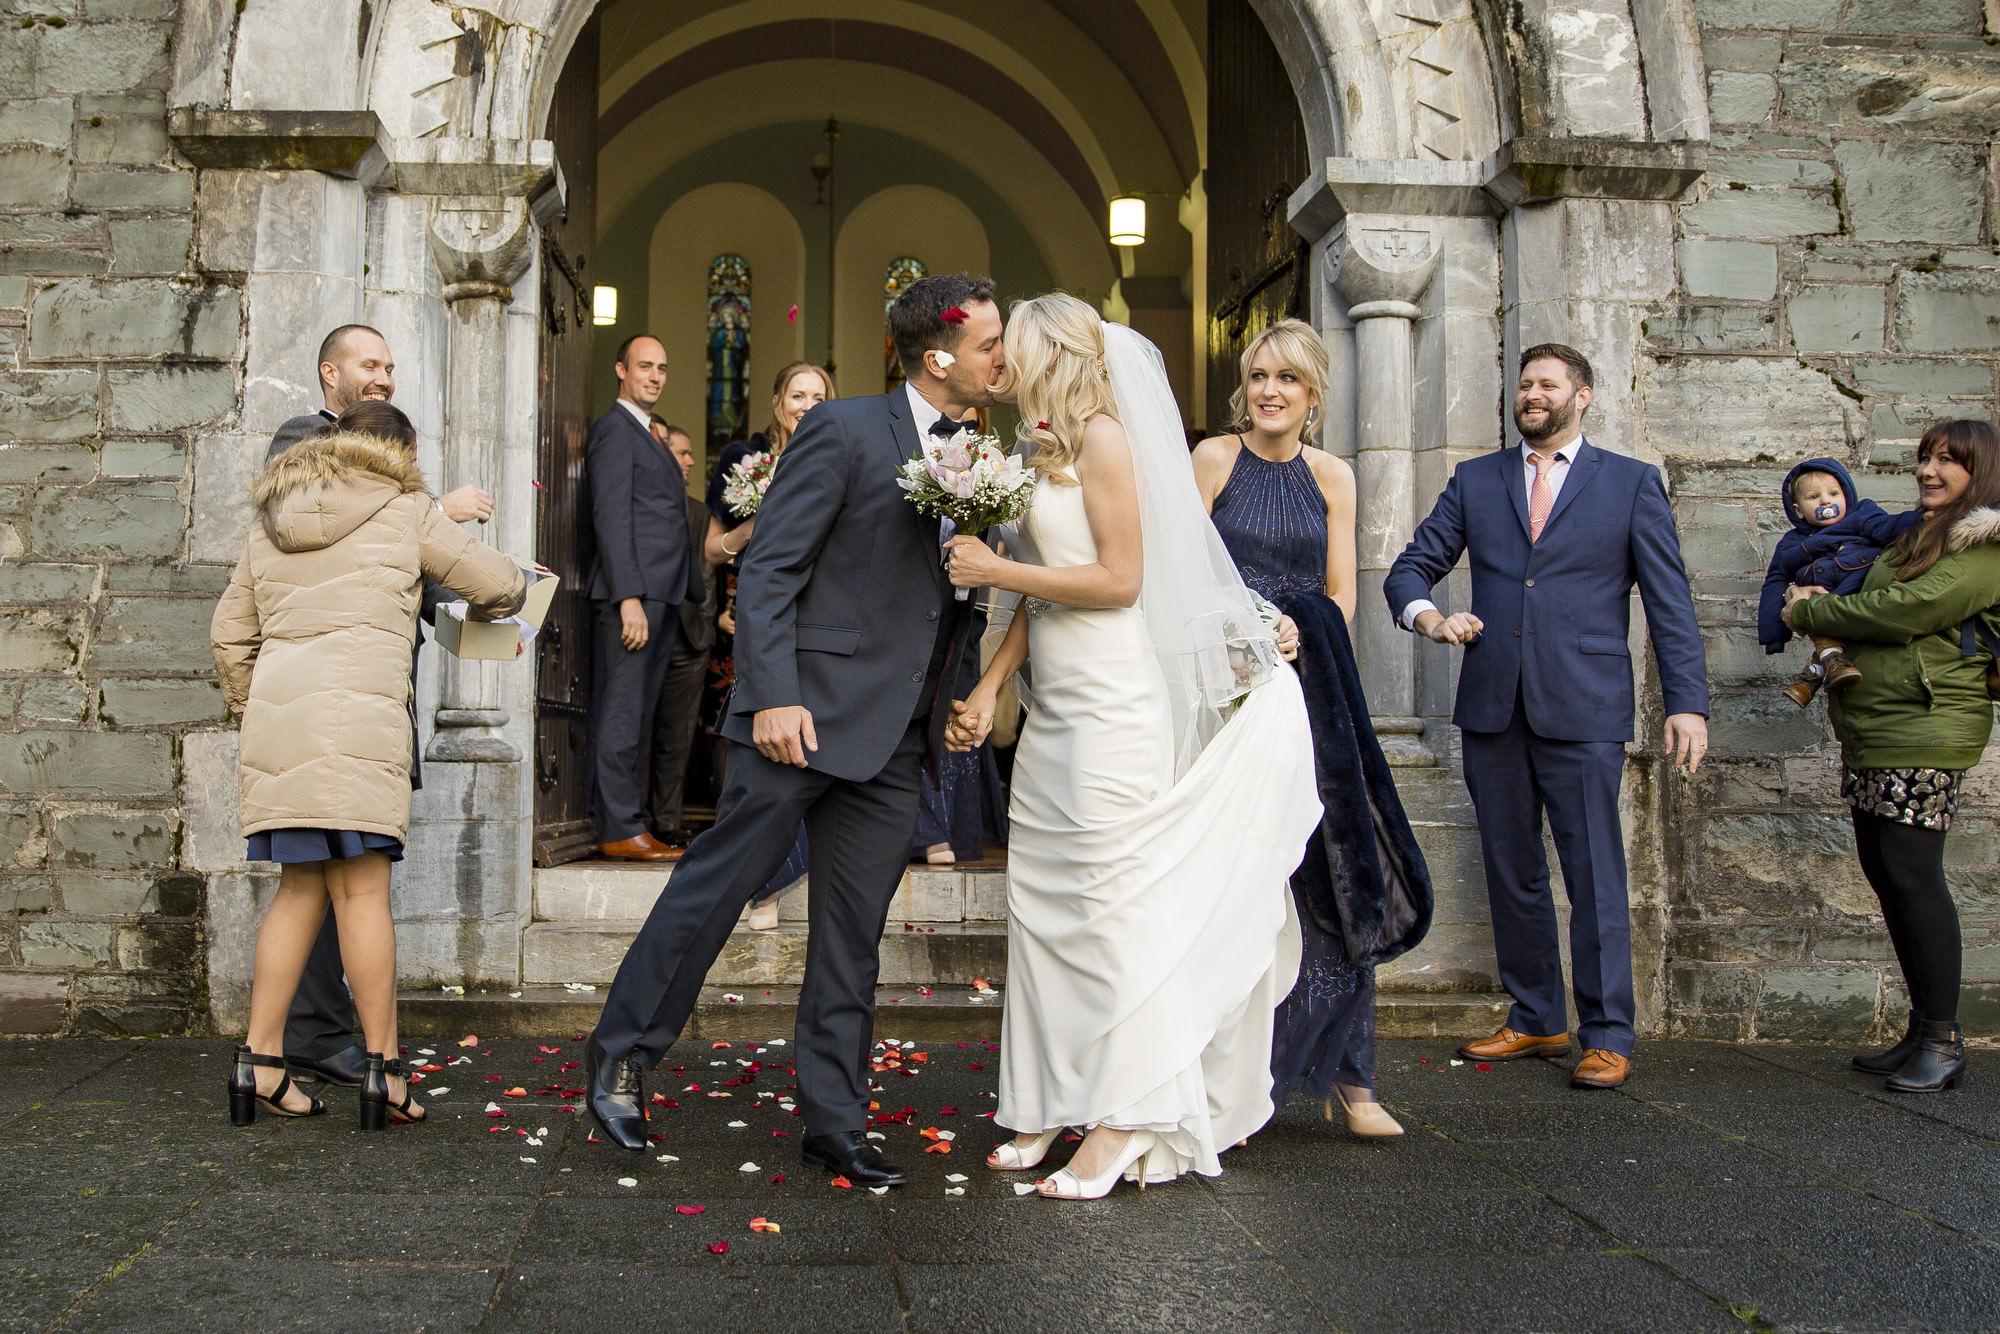 muckross_park_hotel_grougane_barra_wedding_photographer_goldenmoments_039.jpg